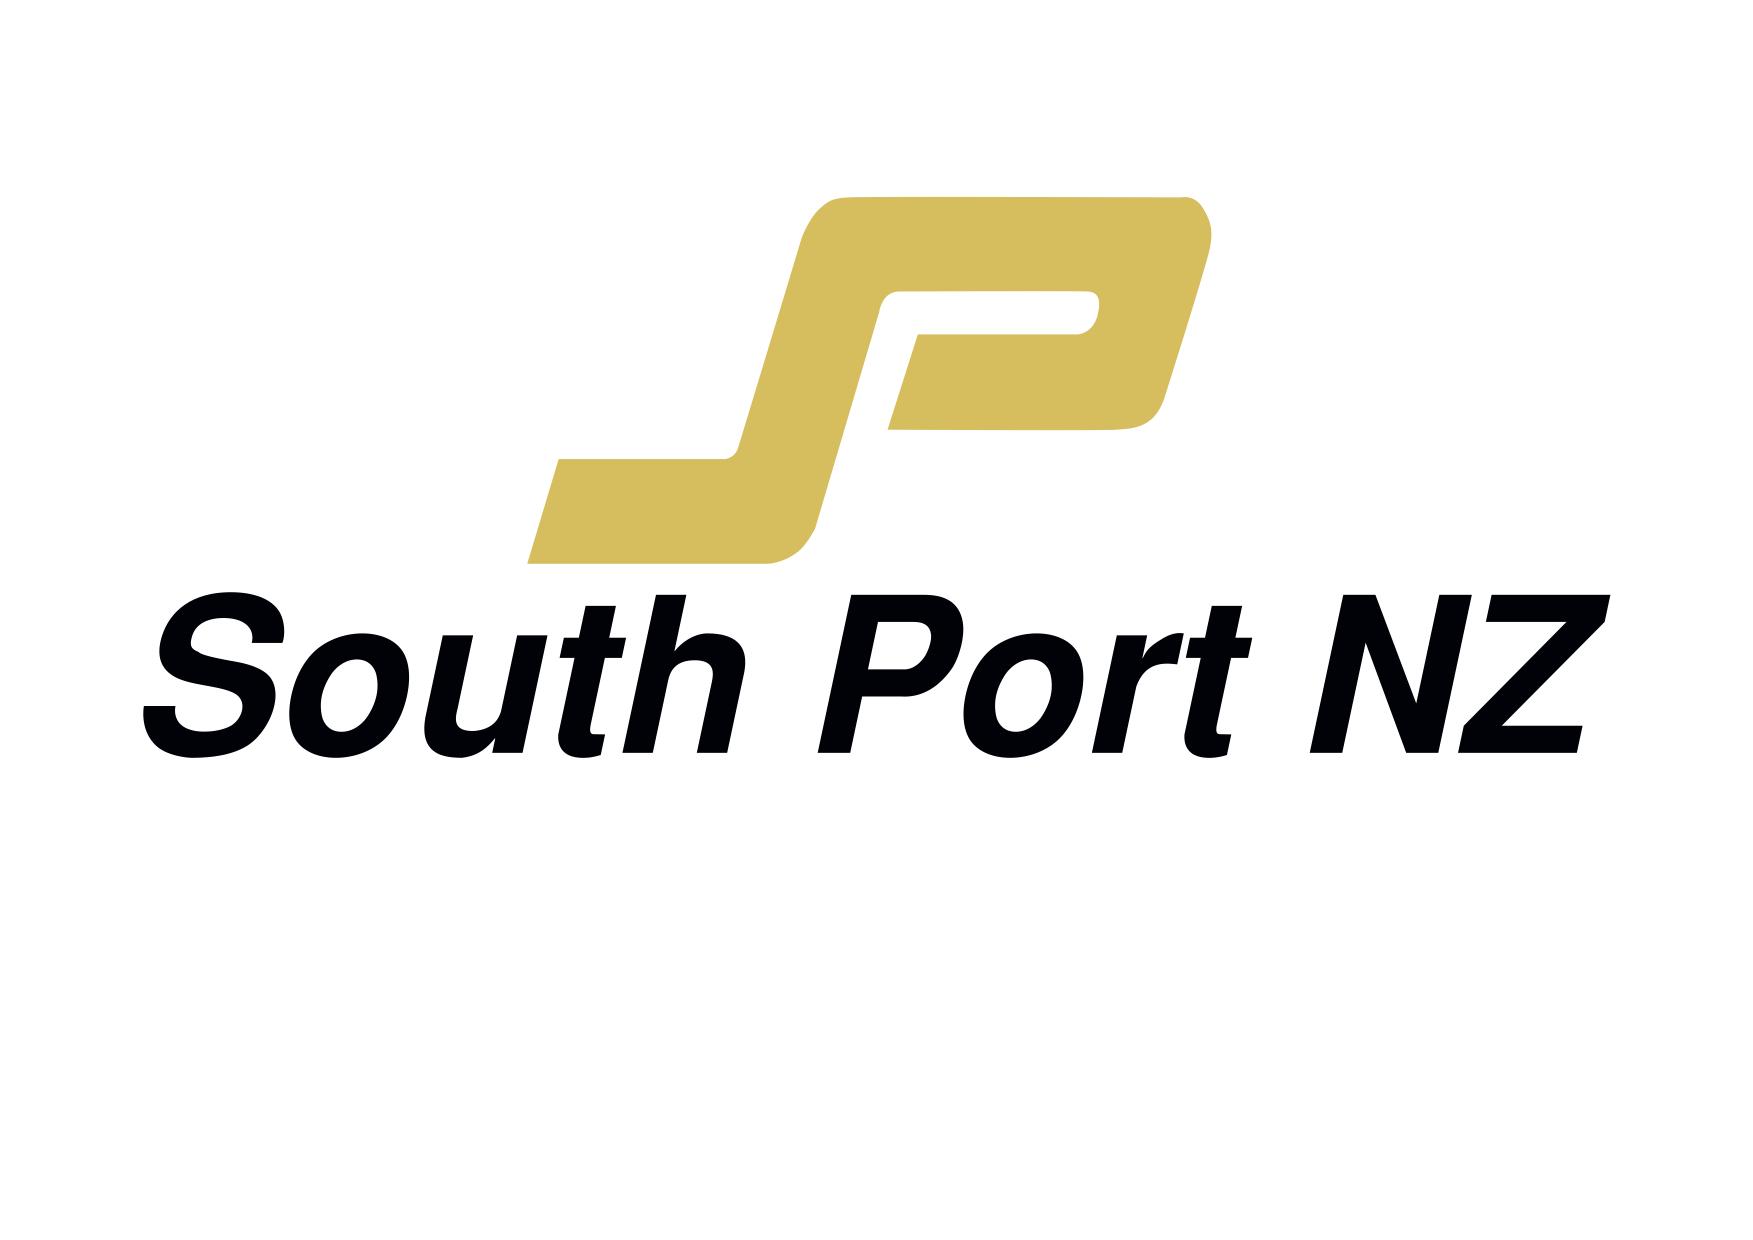 SouthPortNZ.jpg